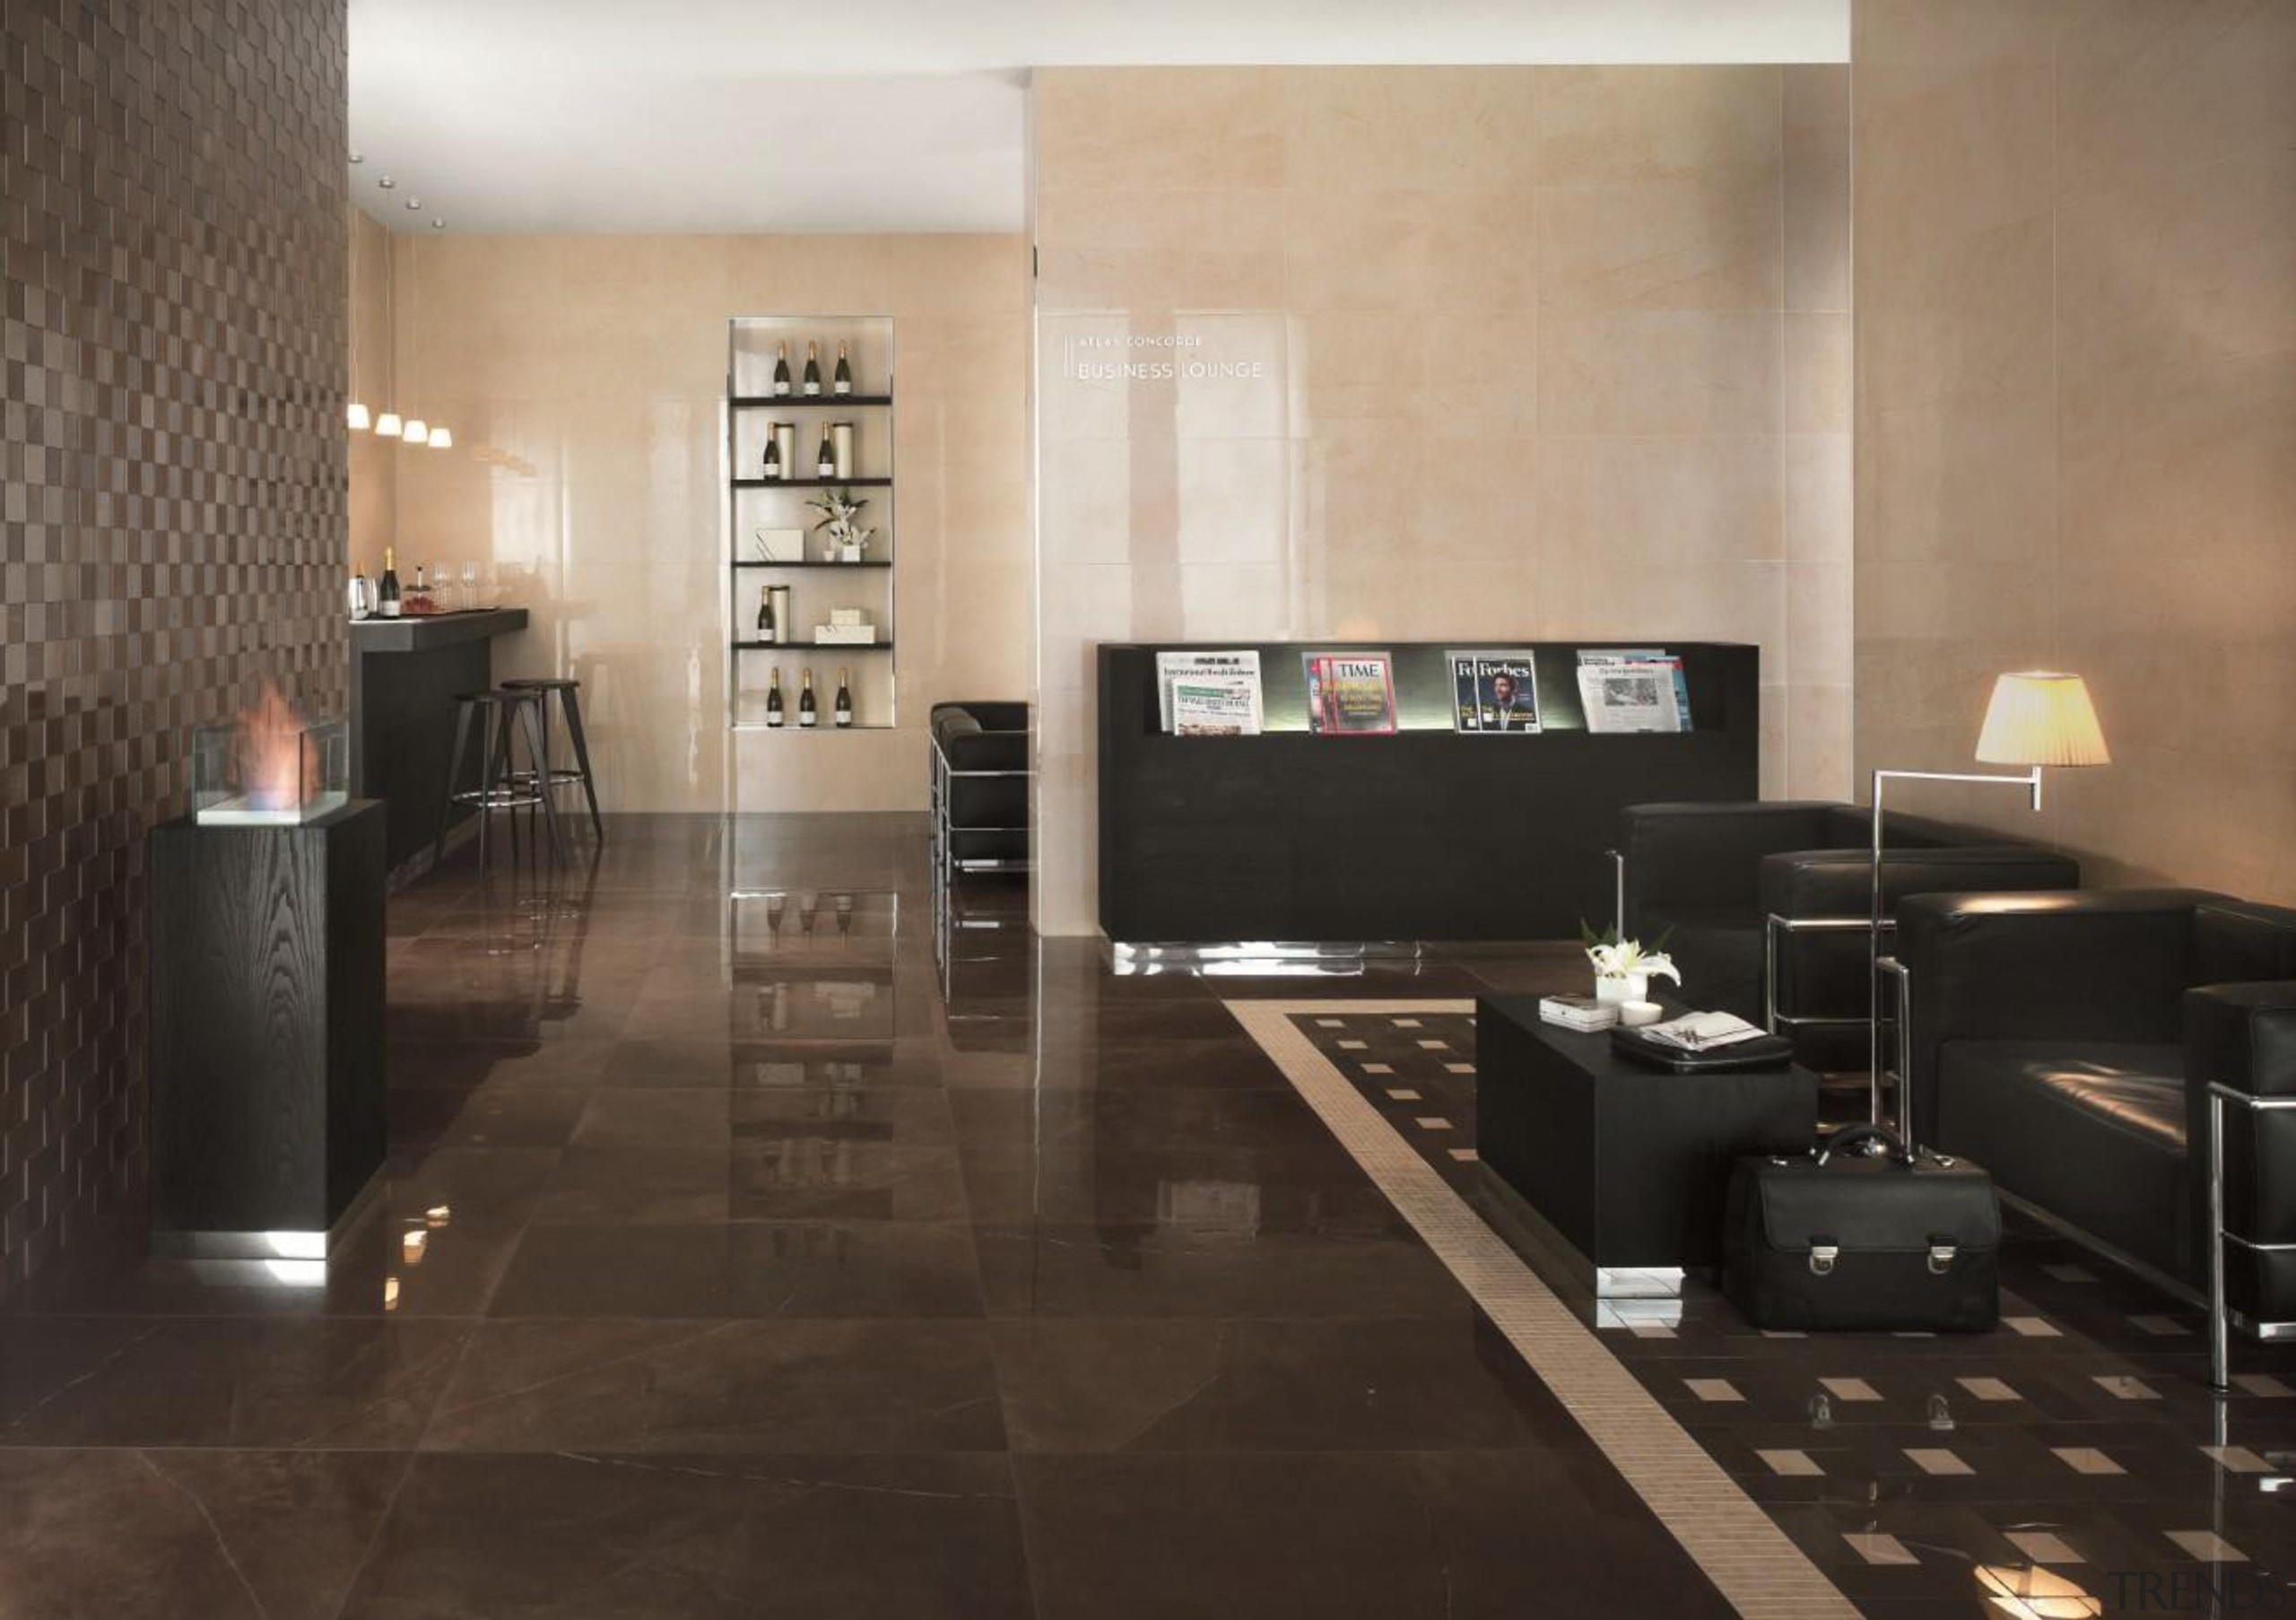 Marvel bronze lounge floor tiles and bronze 3D floor, flooring, furniture, hardwood, interior design, laminate flooring, living room, lobby, room, table, tile, wall, wood, wood flooring, black